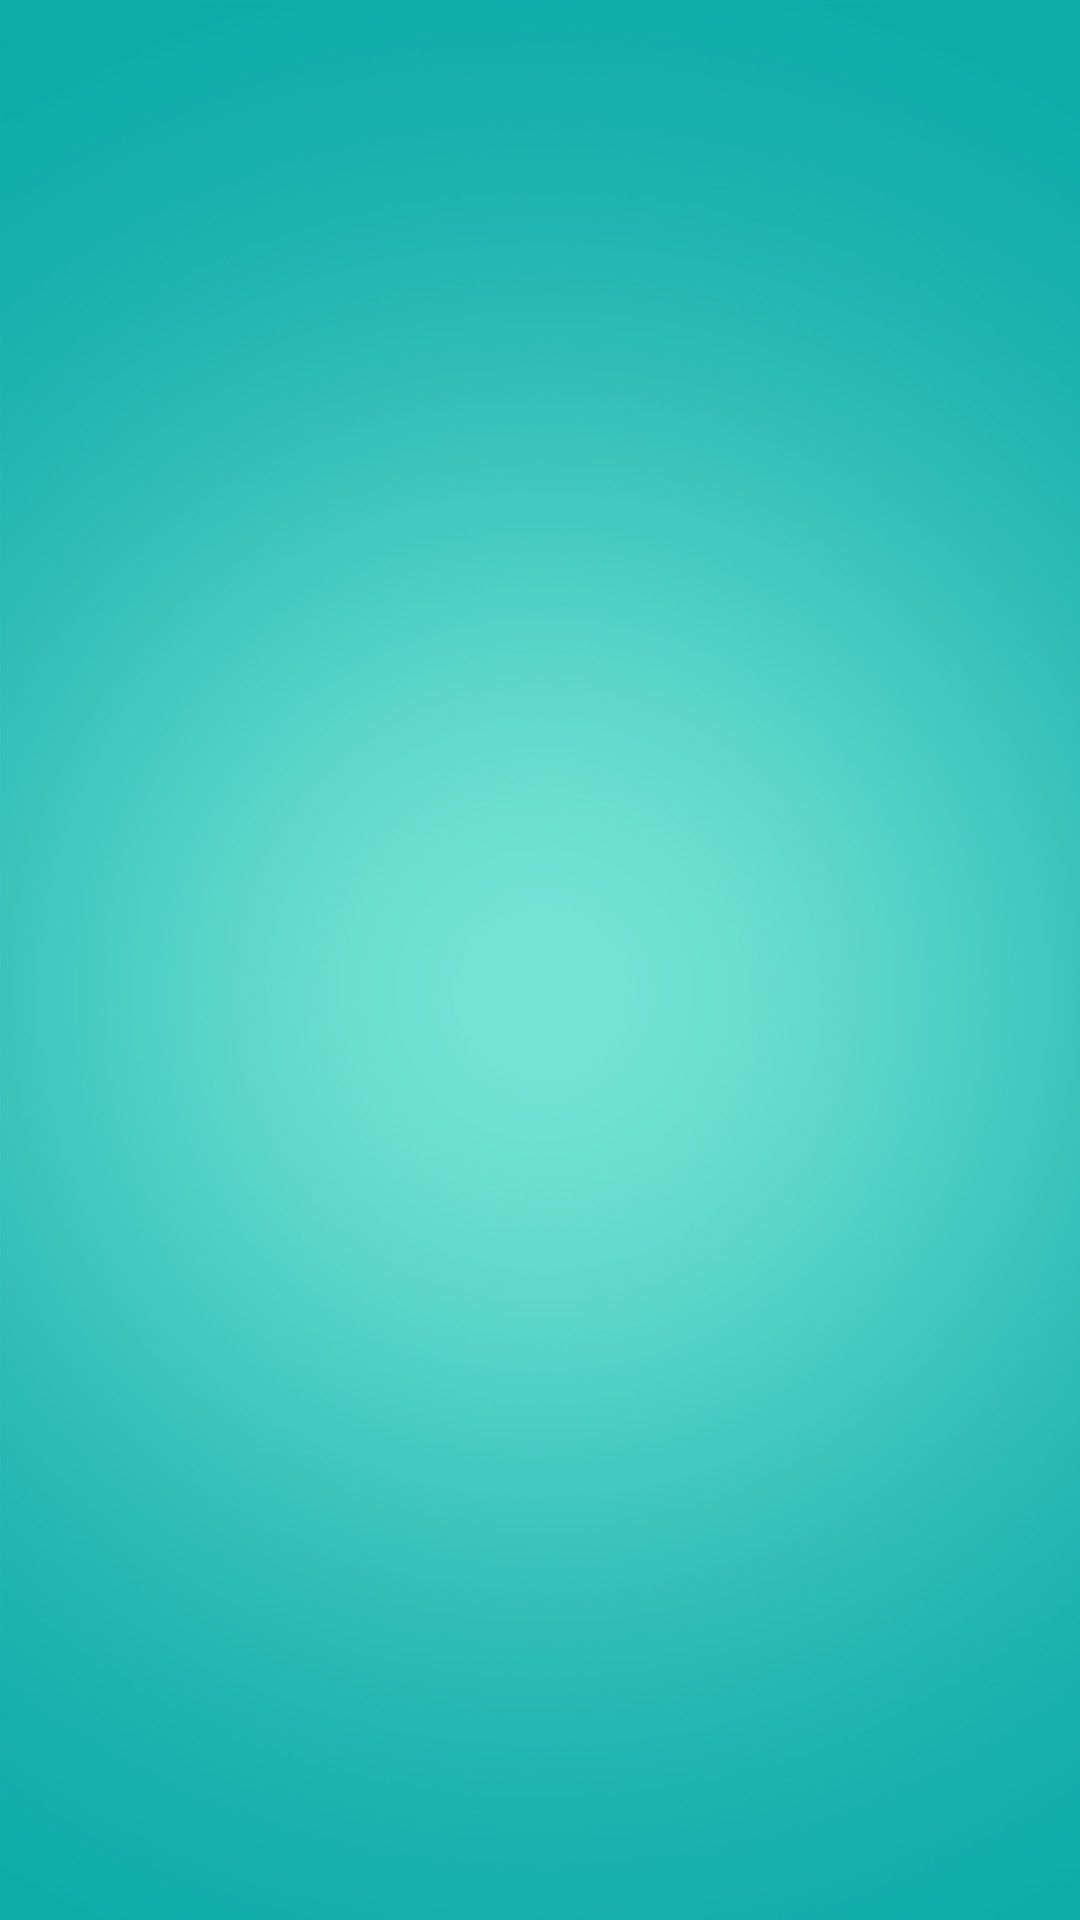 Httpwallpaperformobileorg16856Aqua Wallpaper Iphone